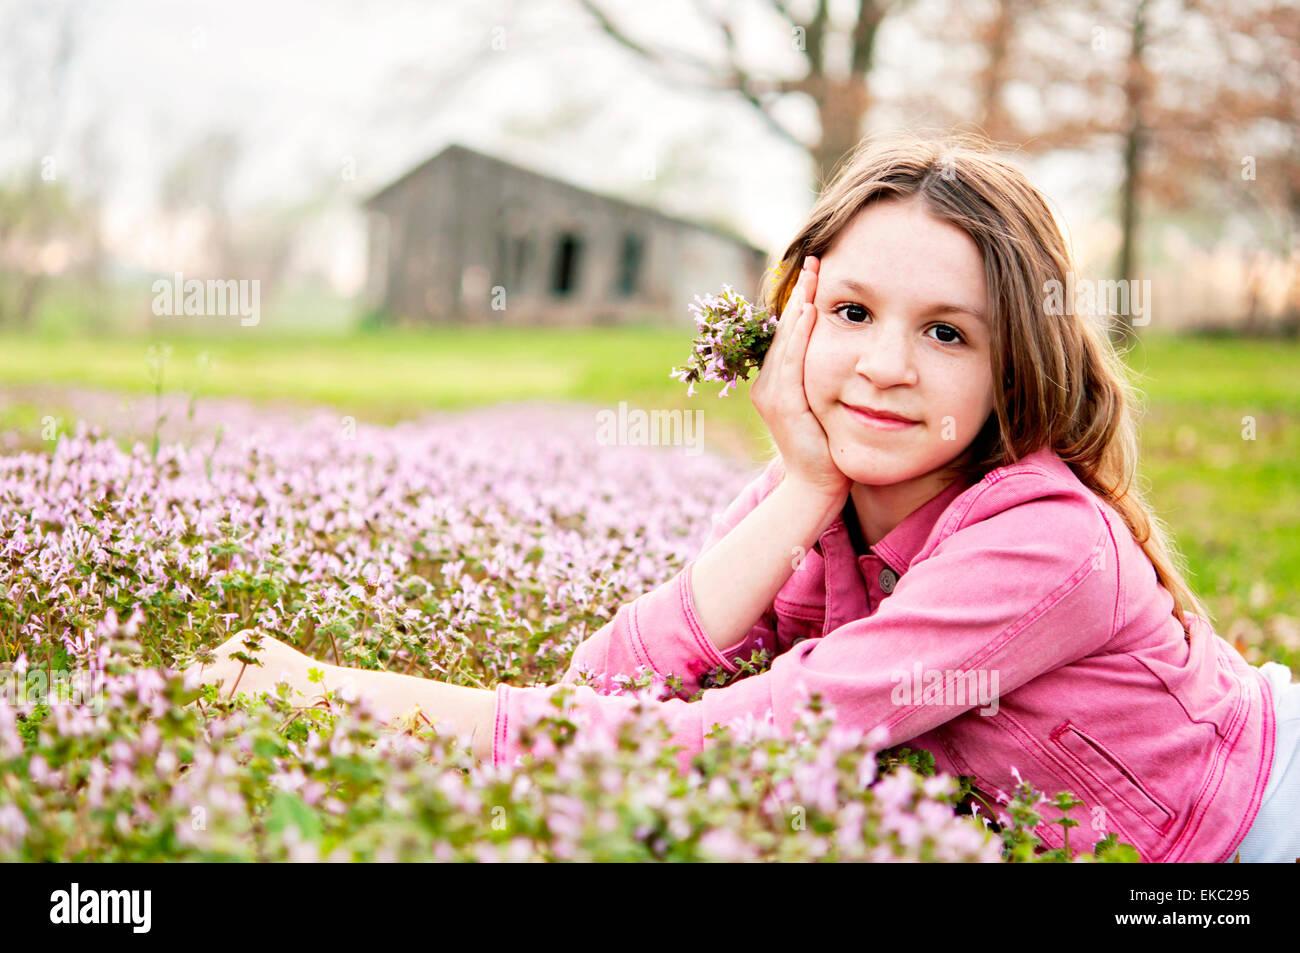 Girl Spring portrait flowers - Stock Image